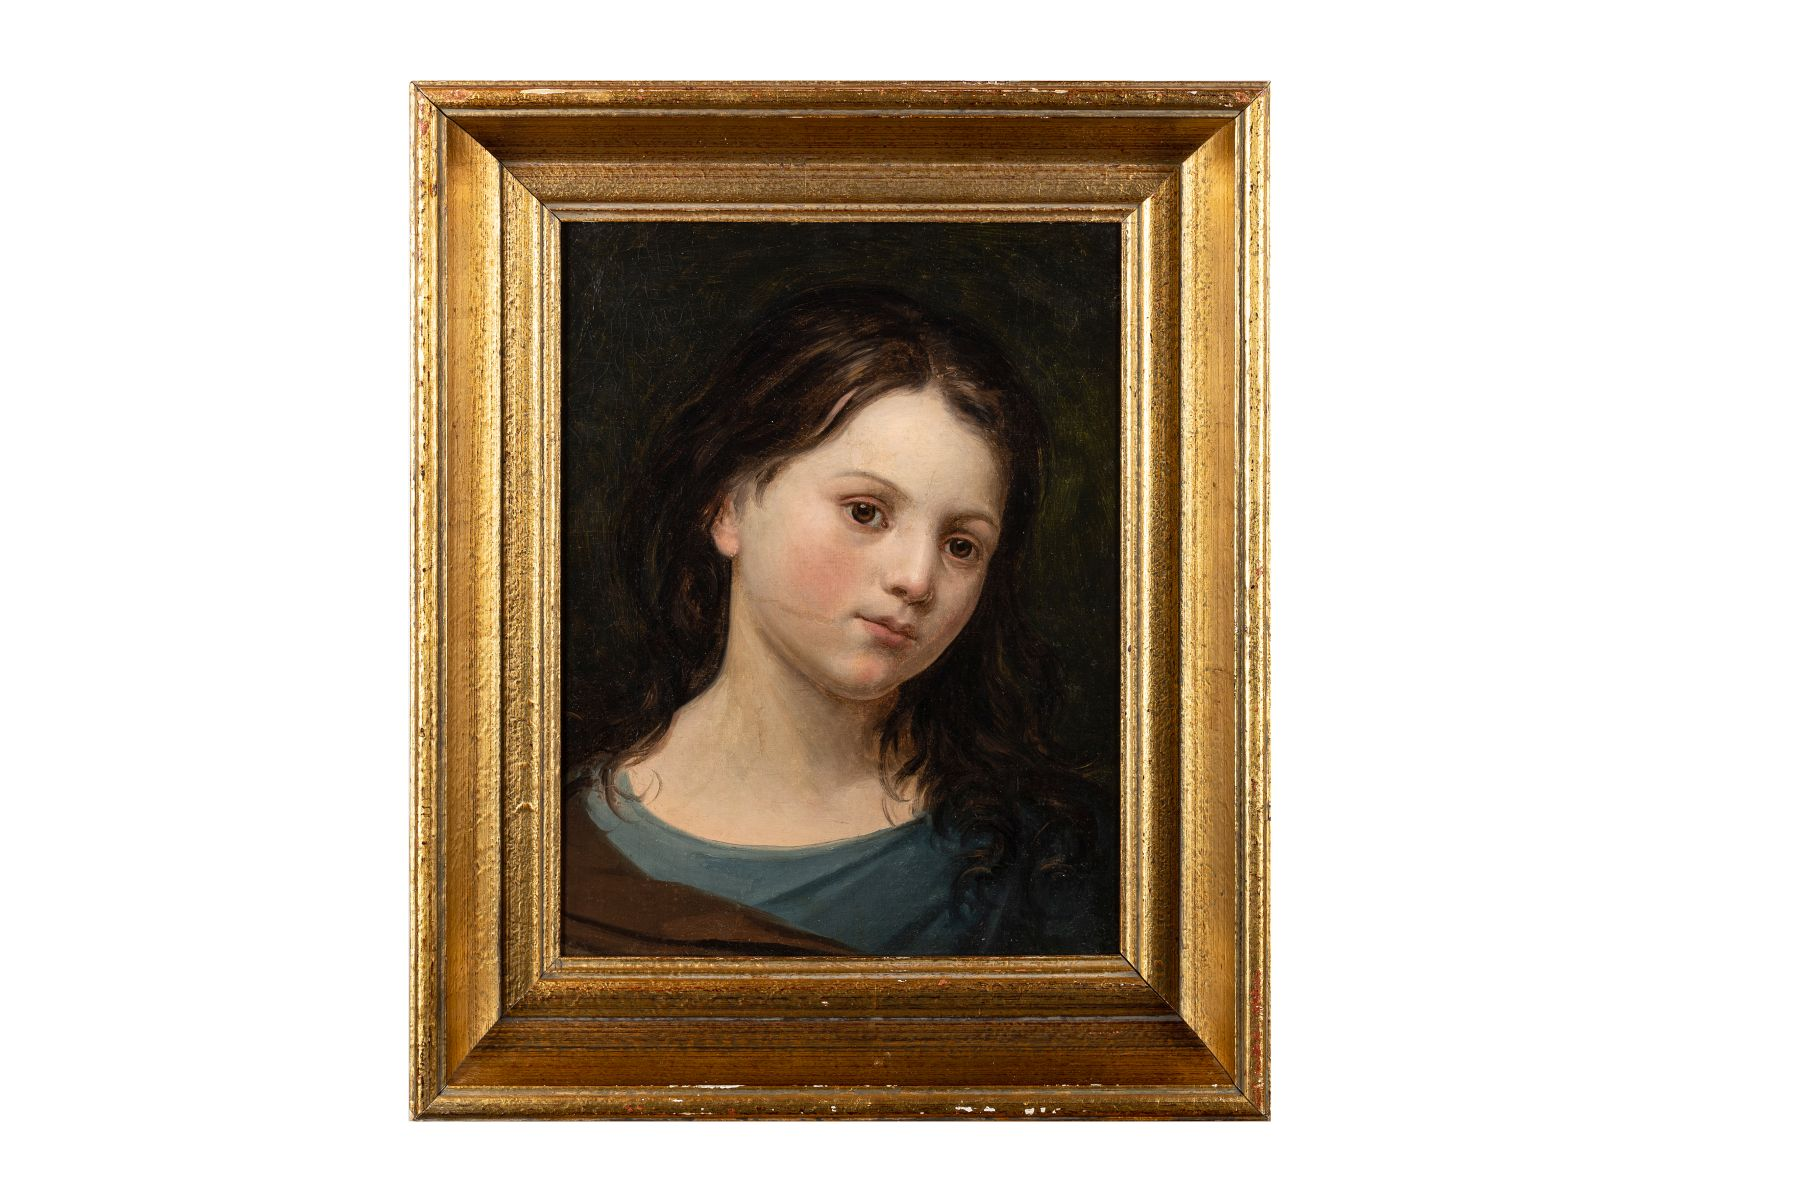 "#116 Peter Fendi Circle, ""Girl Portrait"" | Peter Fendi (1796-1842) Umkreis, ""Mädchenporträt"" Image"